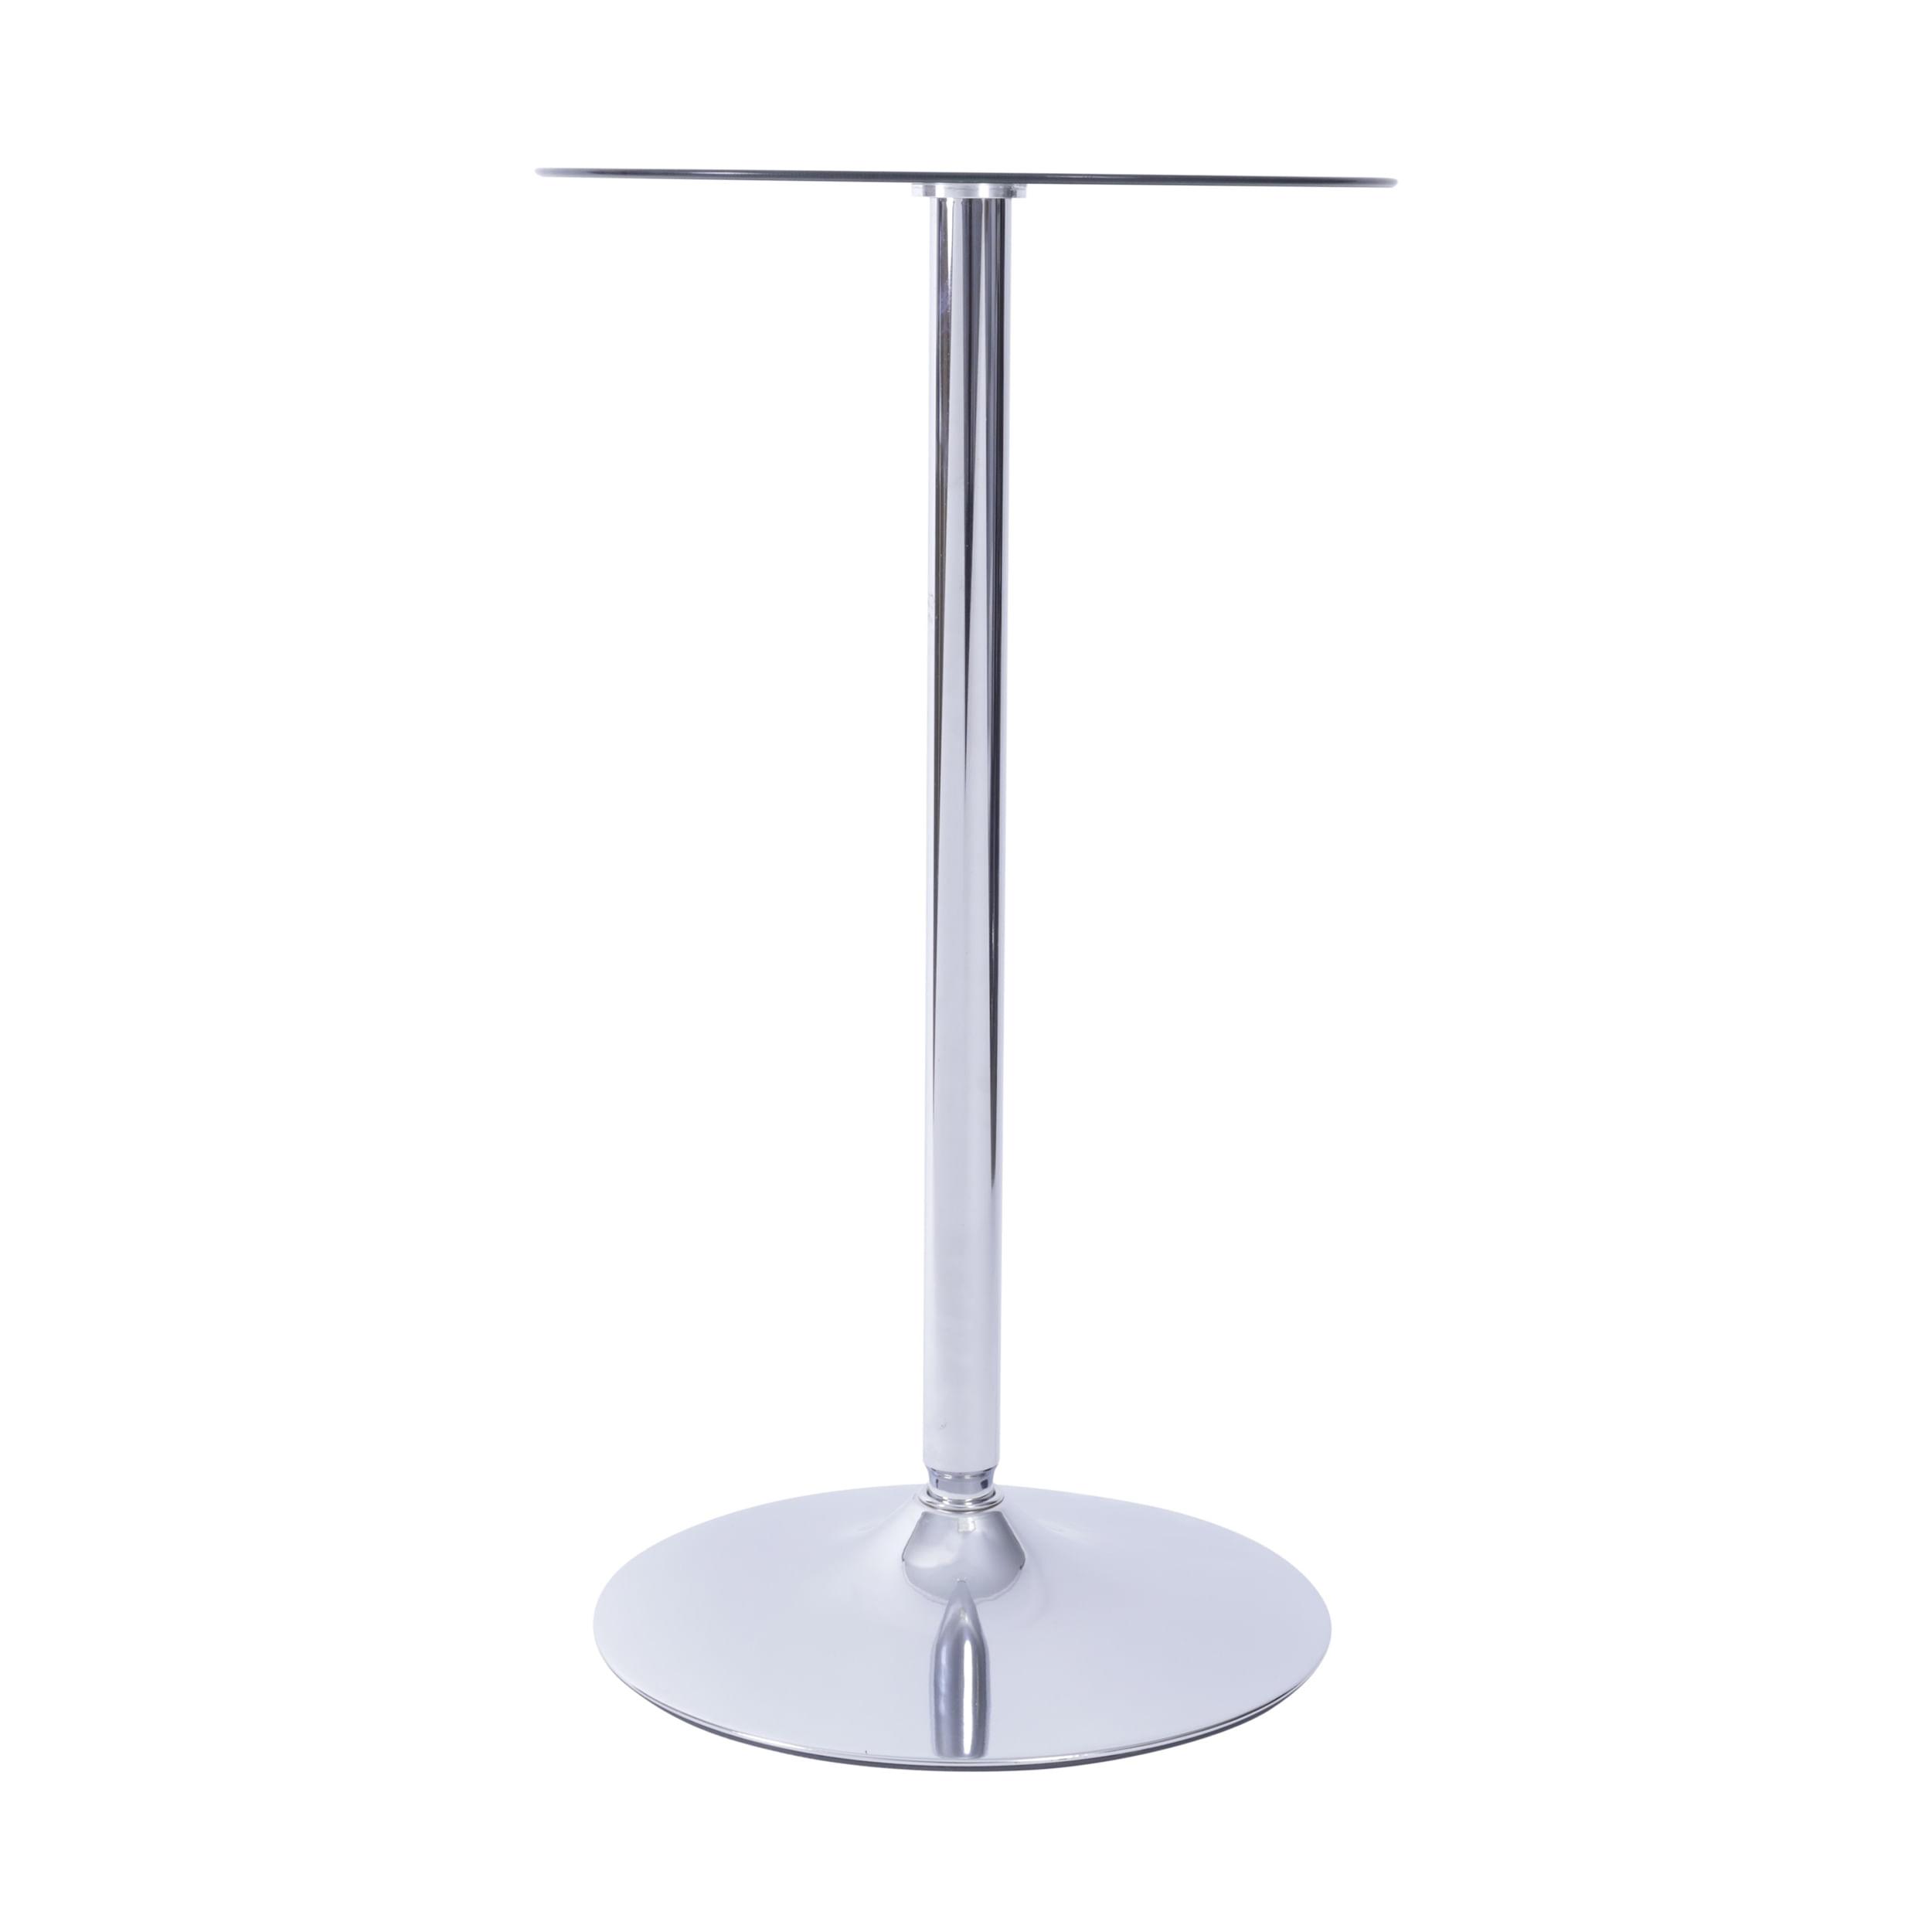 Mesa Bistro com Tampo de Vidro Temperado Base Disco Cromado 60 cm (LARG) - 51778